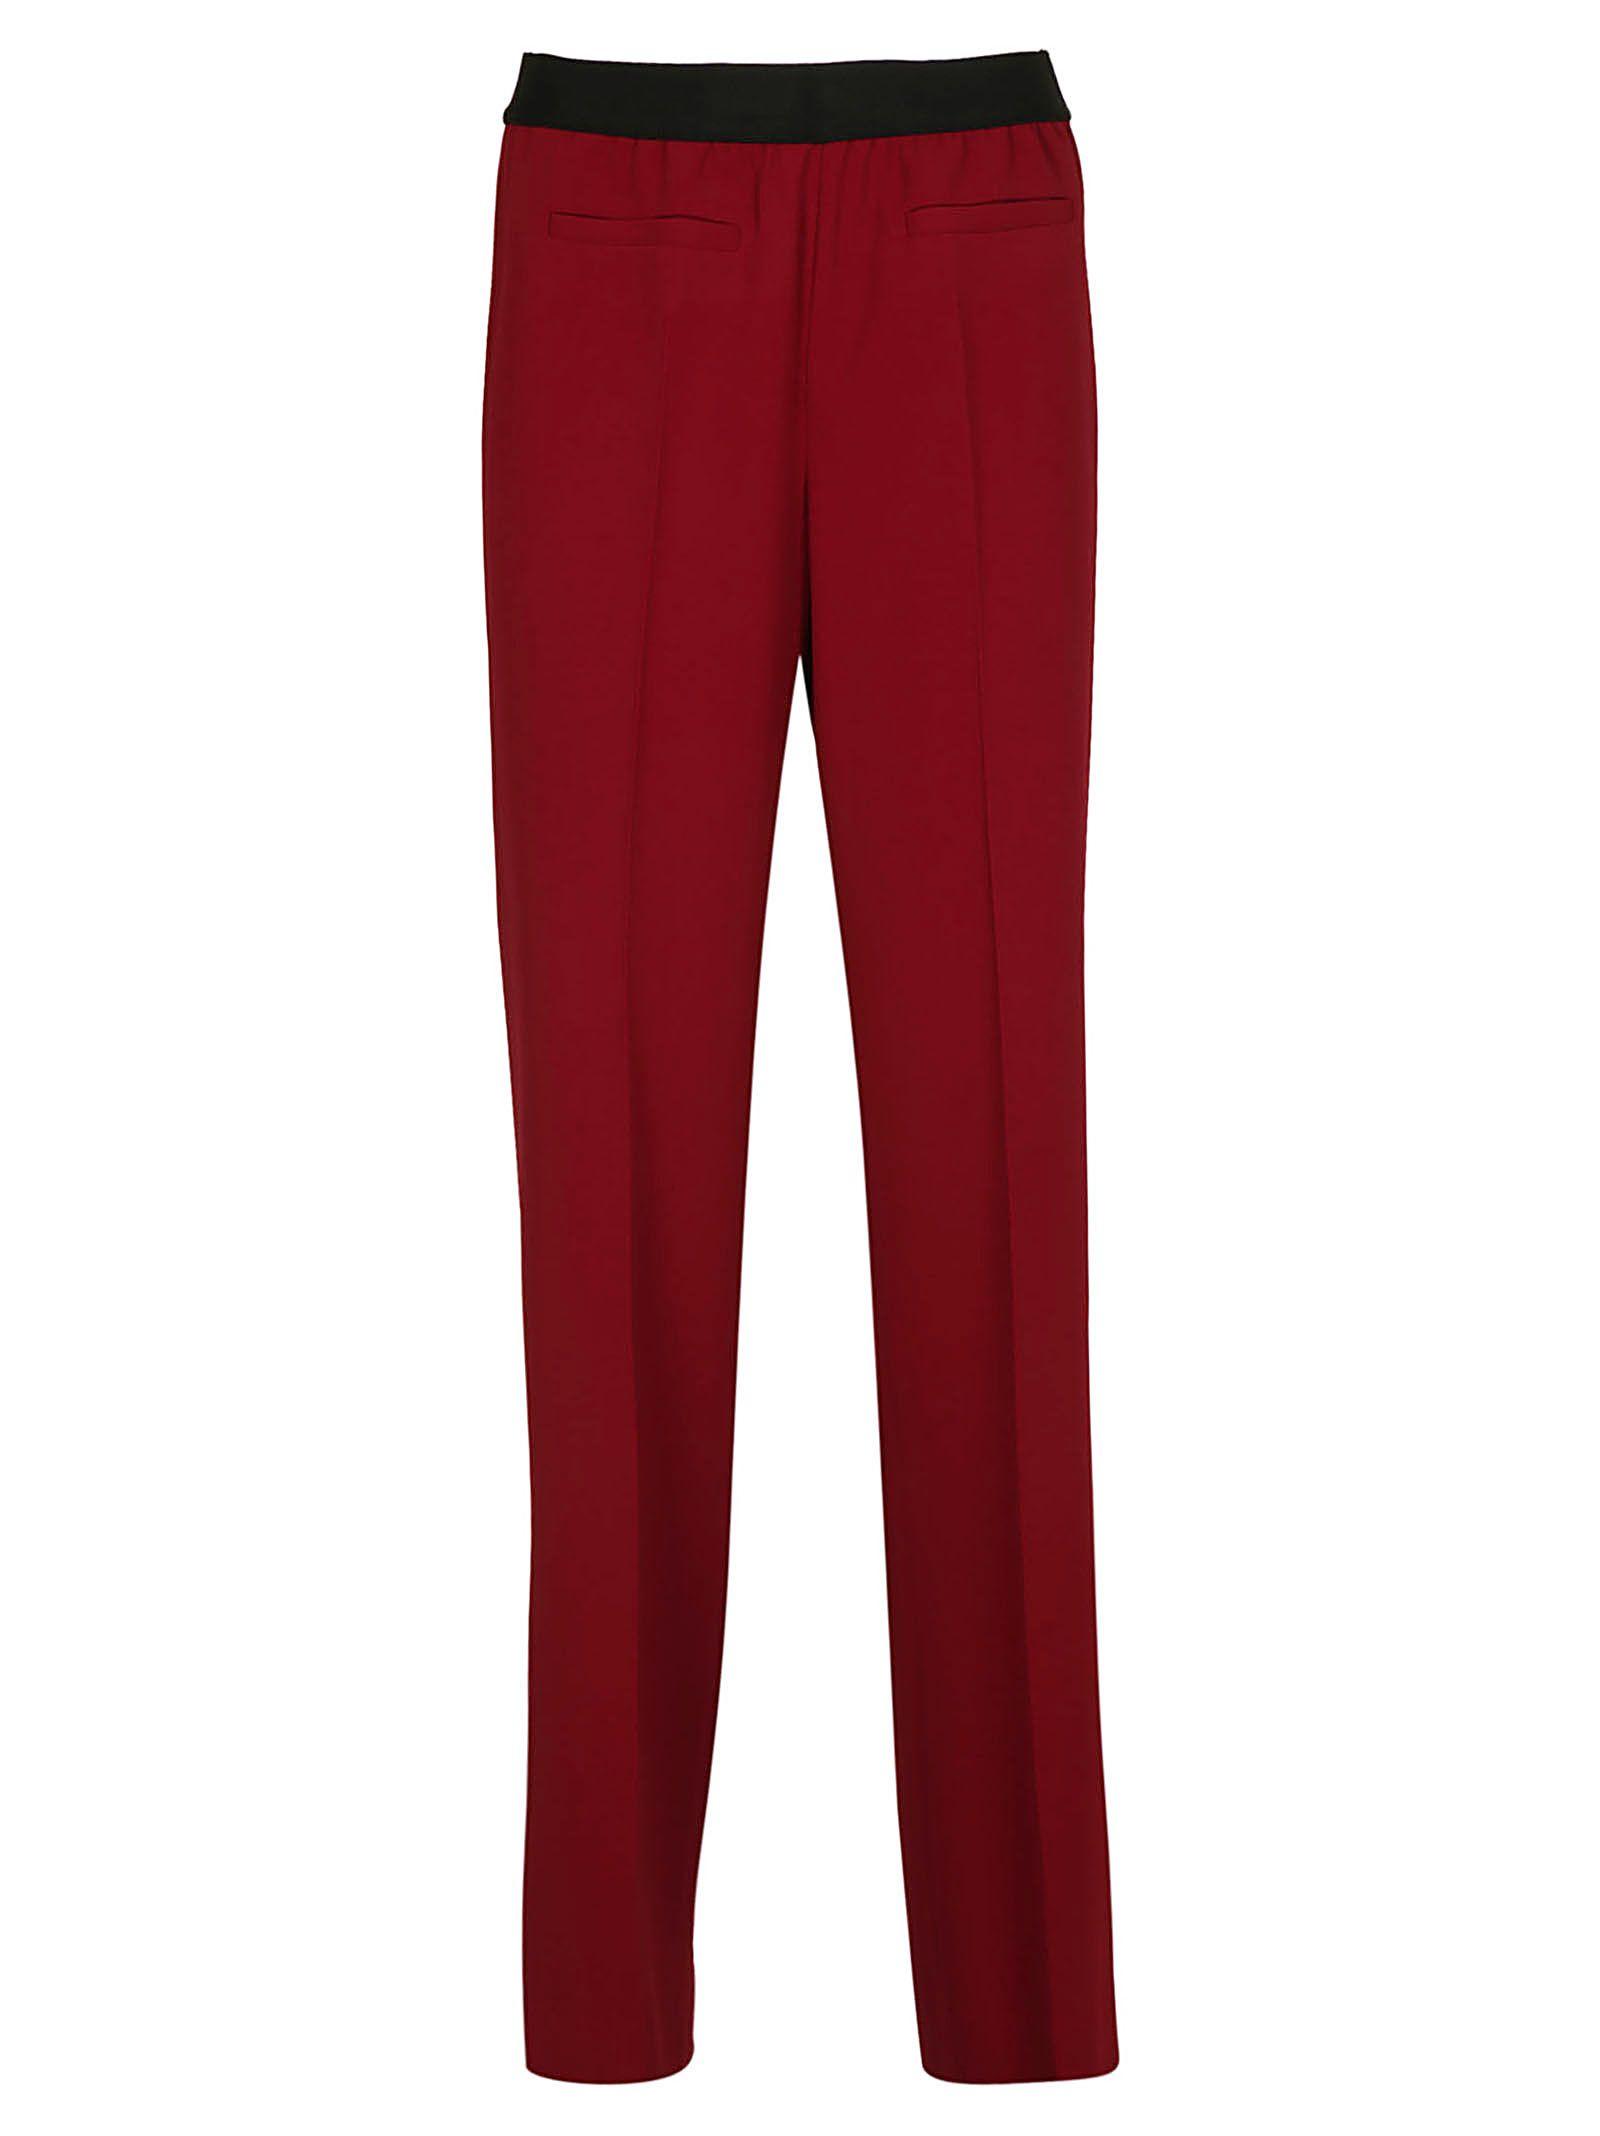 NEWYORKINDUSTRIE New York Industrie Classic Trousers in Bordo'